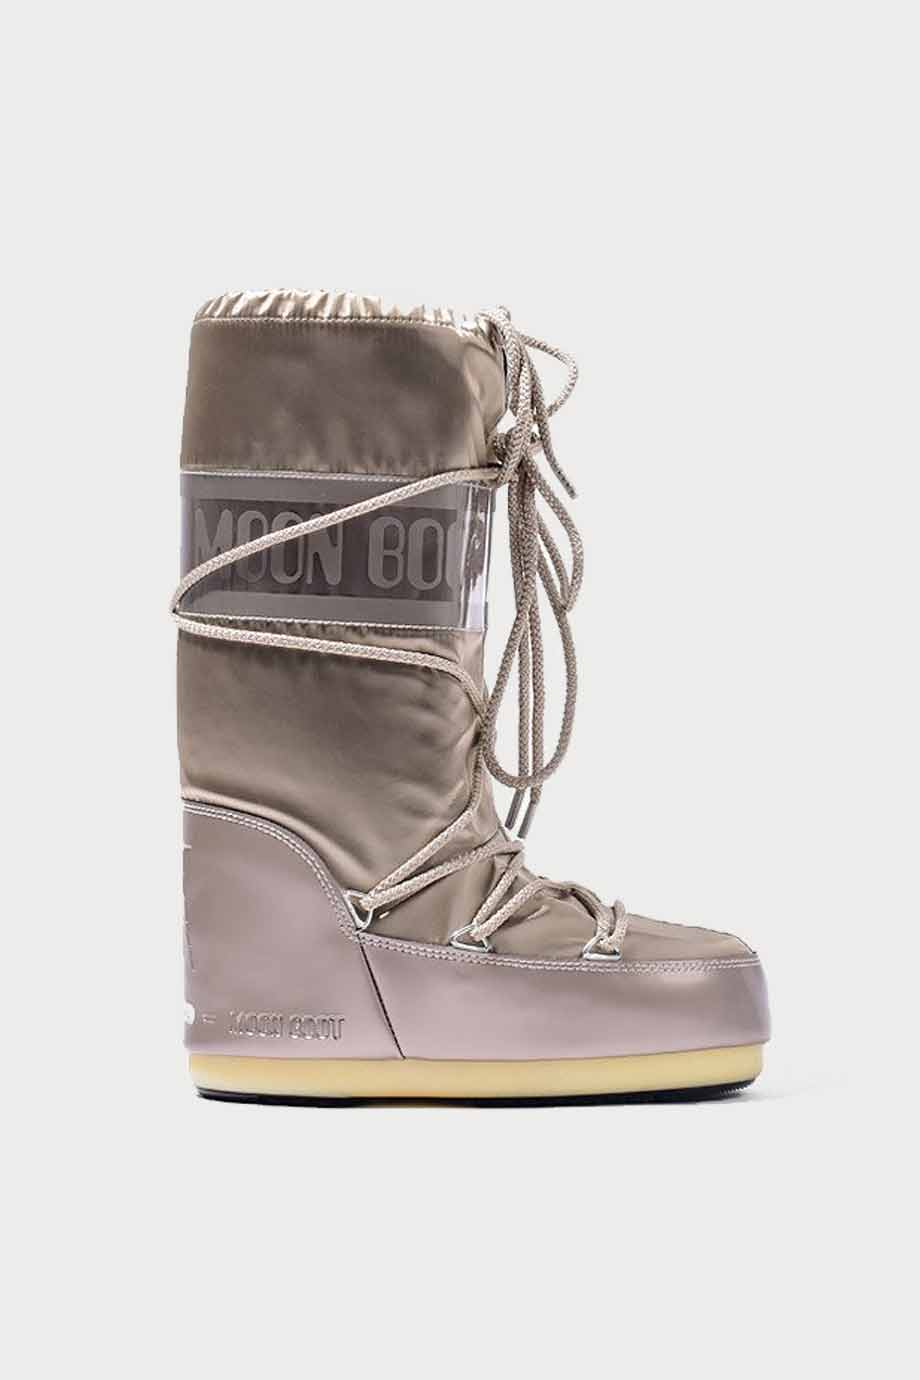 spiridoula metheniti shoes xalkida p 14016800 001 rose gold high MoonBoot